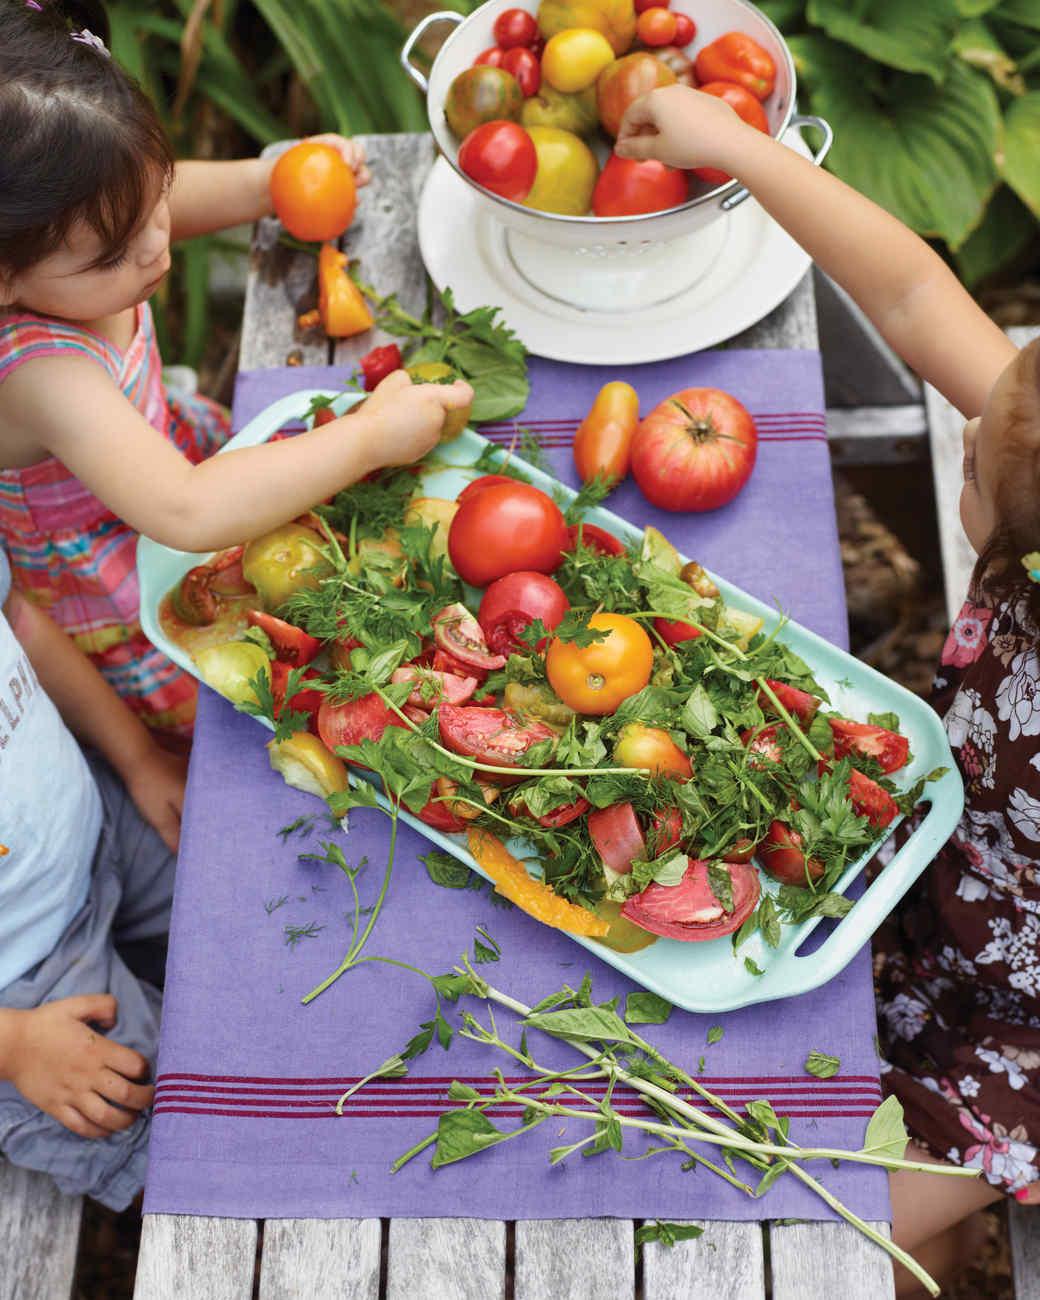 mld106444_0311_a100813_tomato_salad.jpg